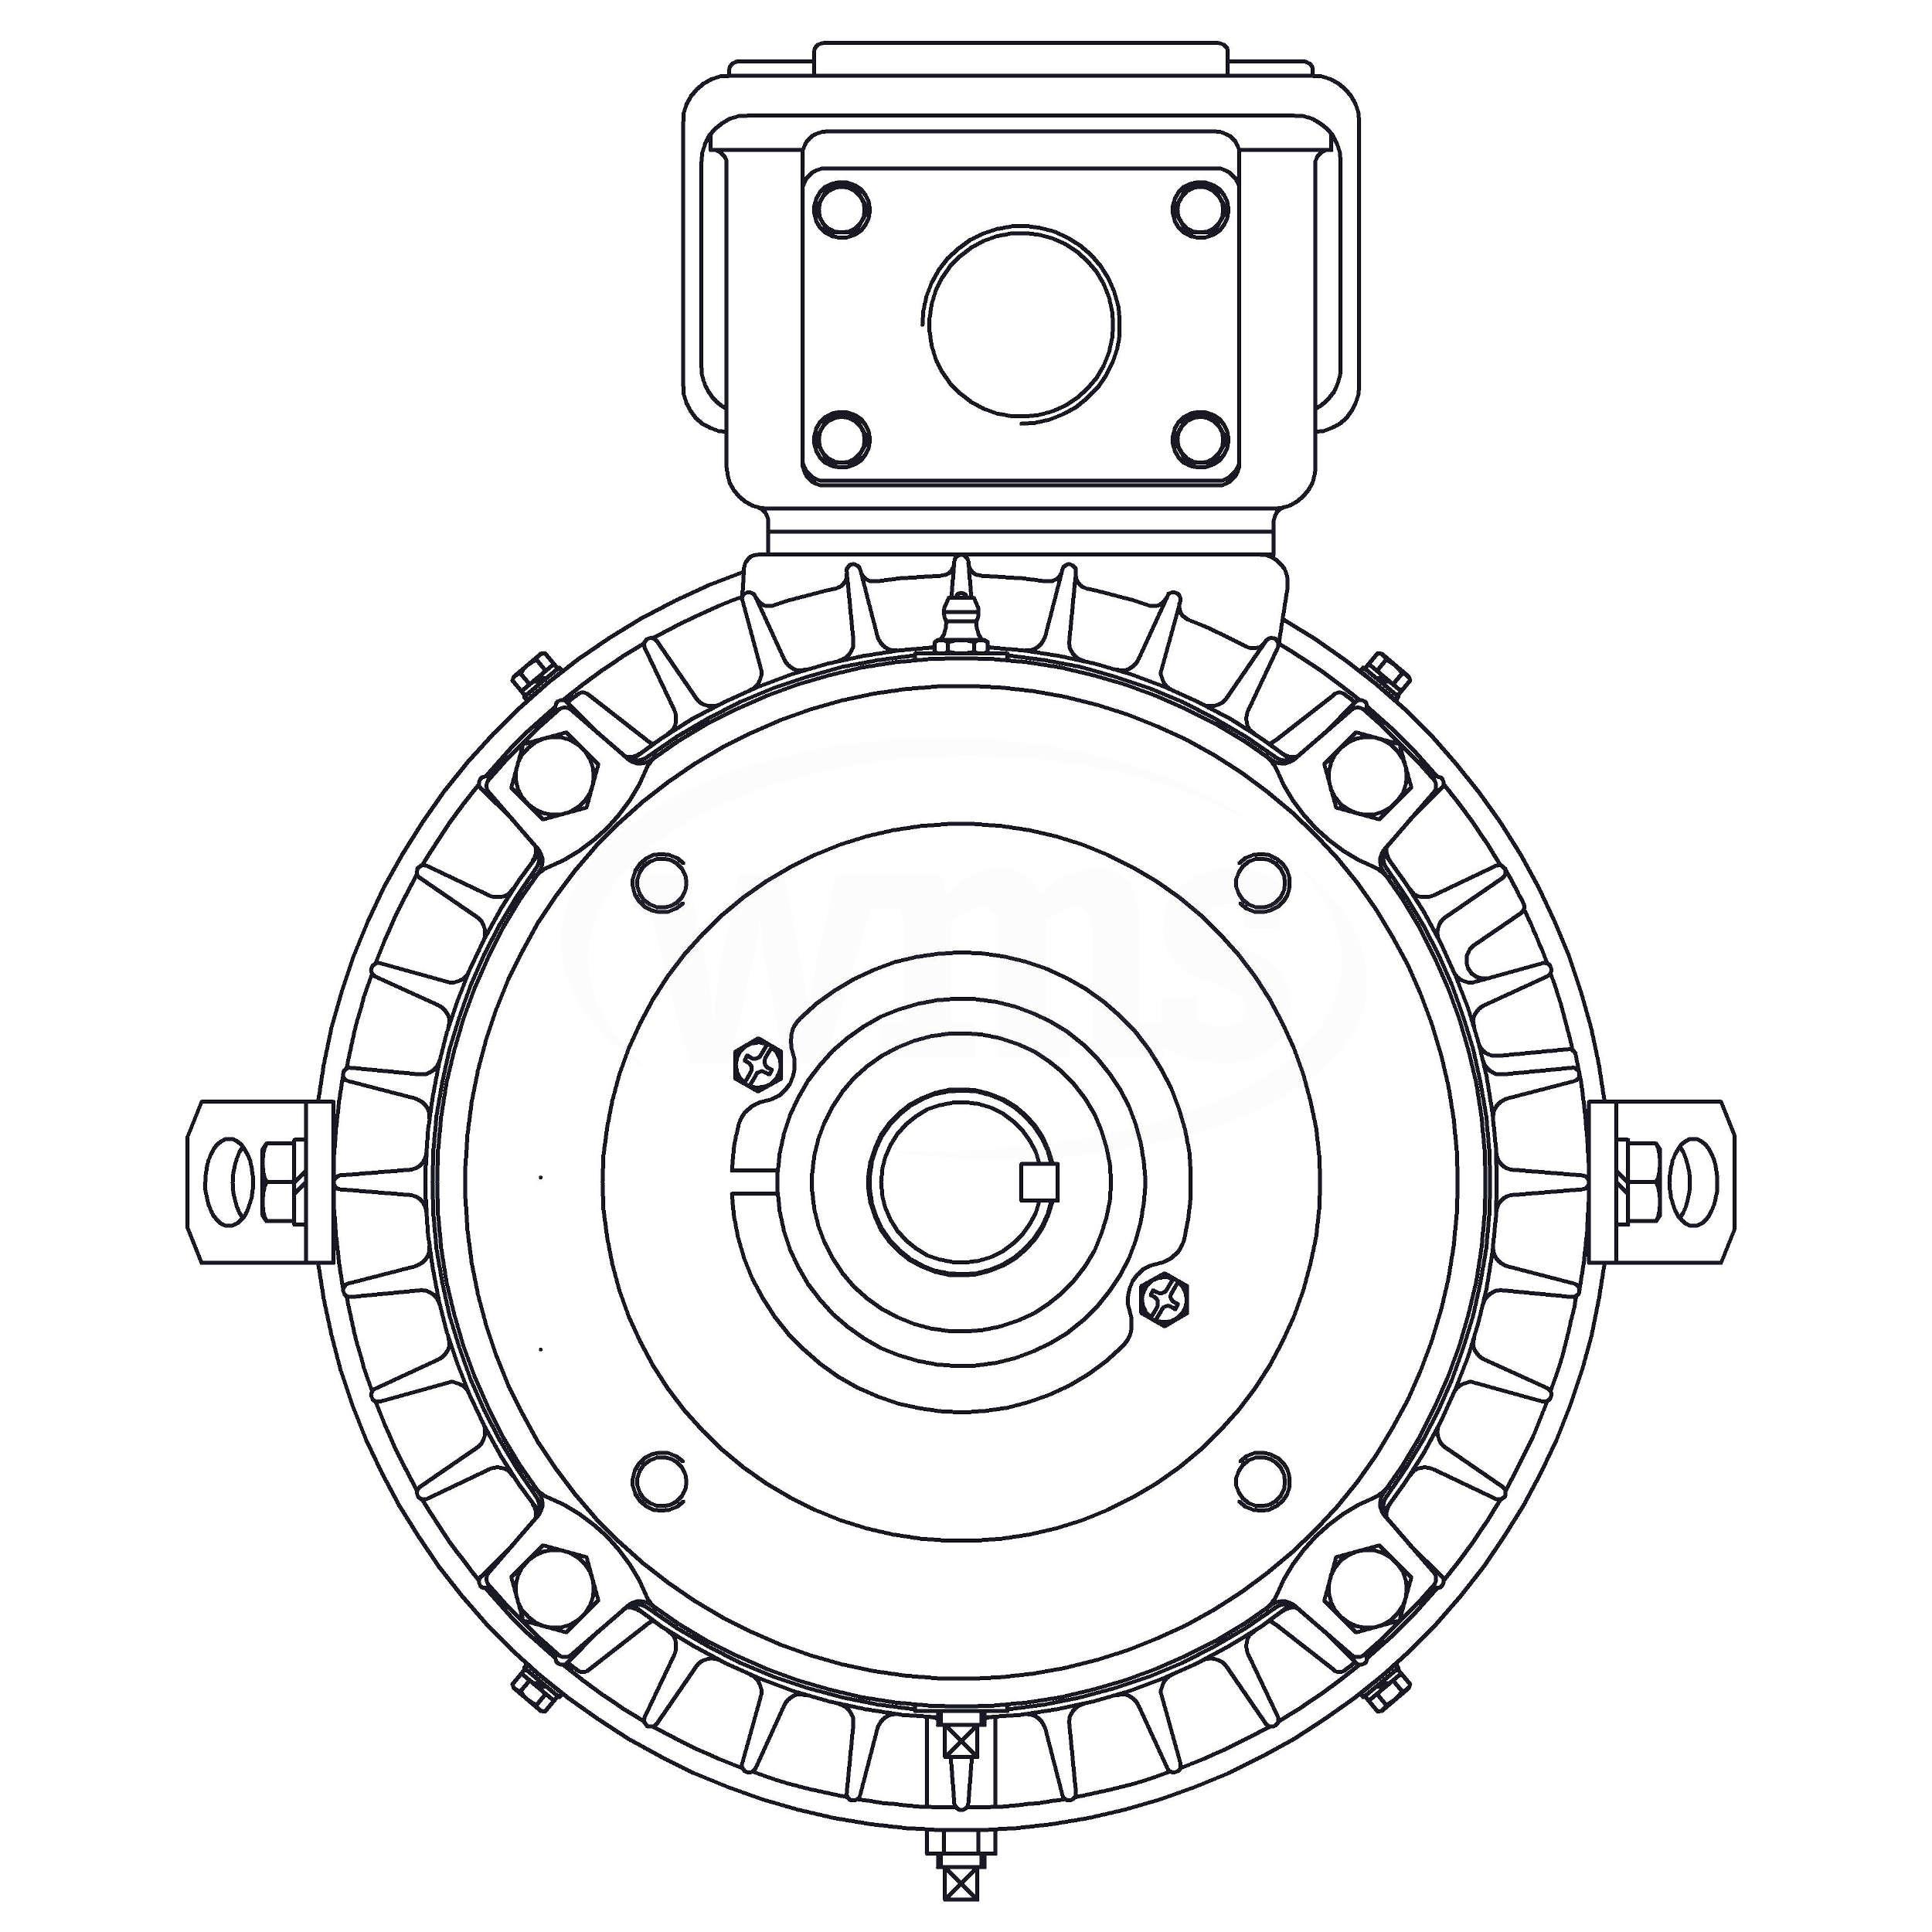 HBV0104C Teco-Westinghouse 10HP MAX-E2/841 Cast Iron